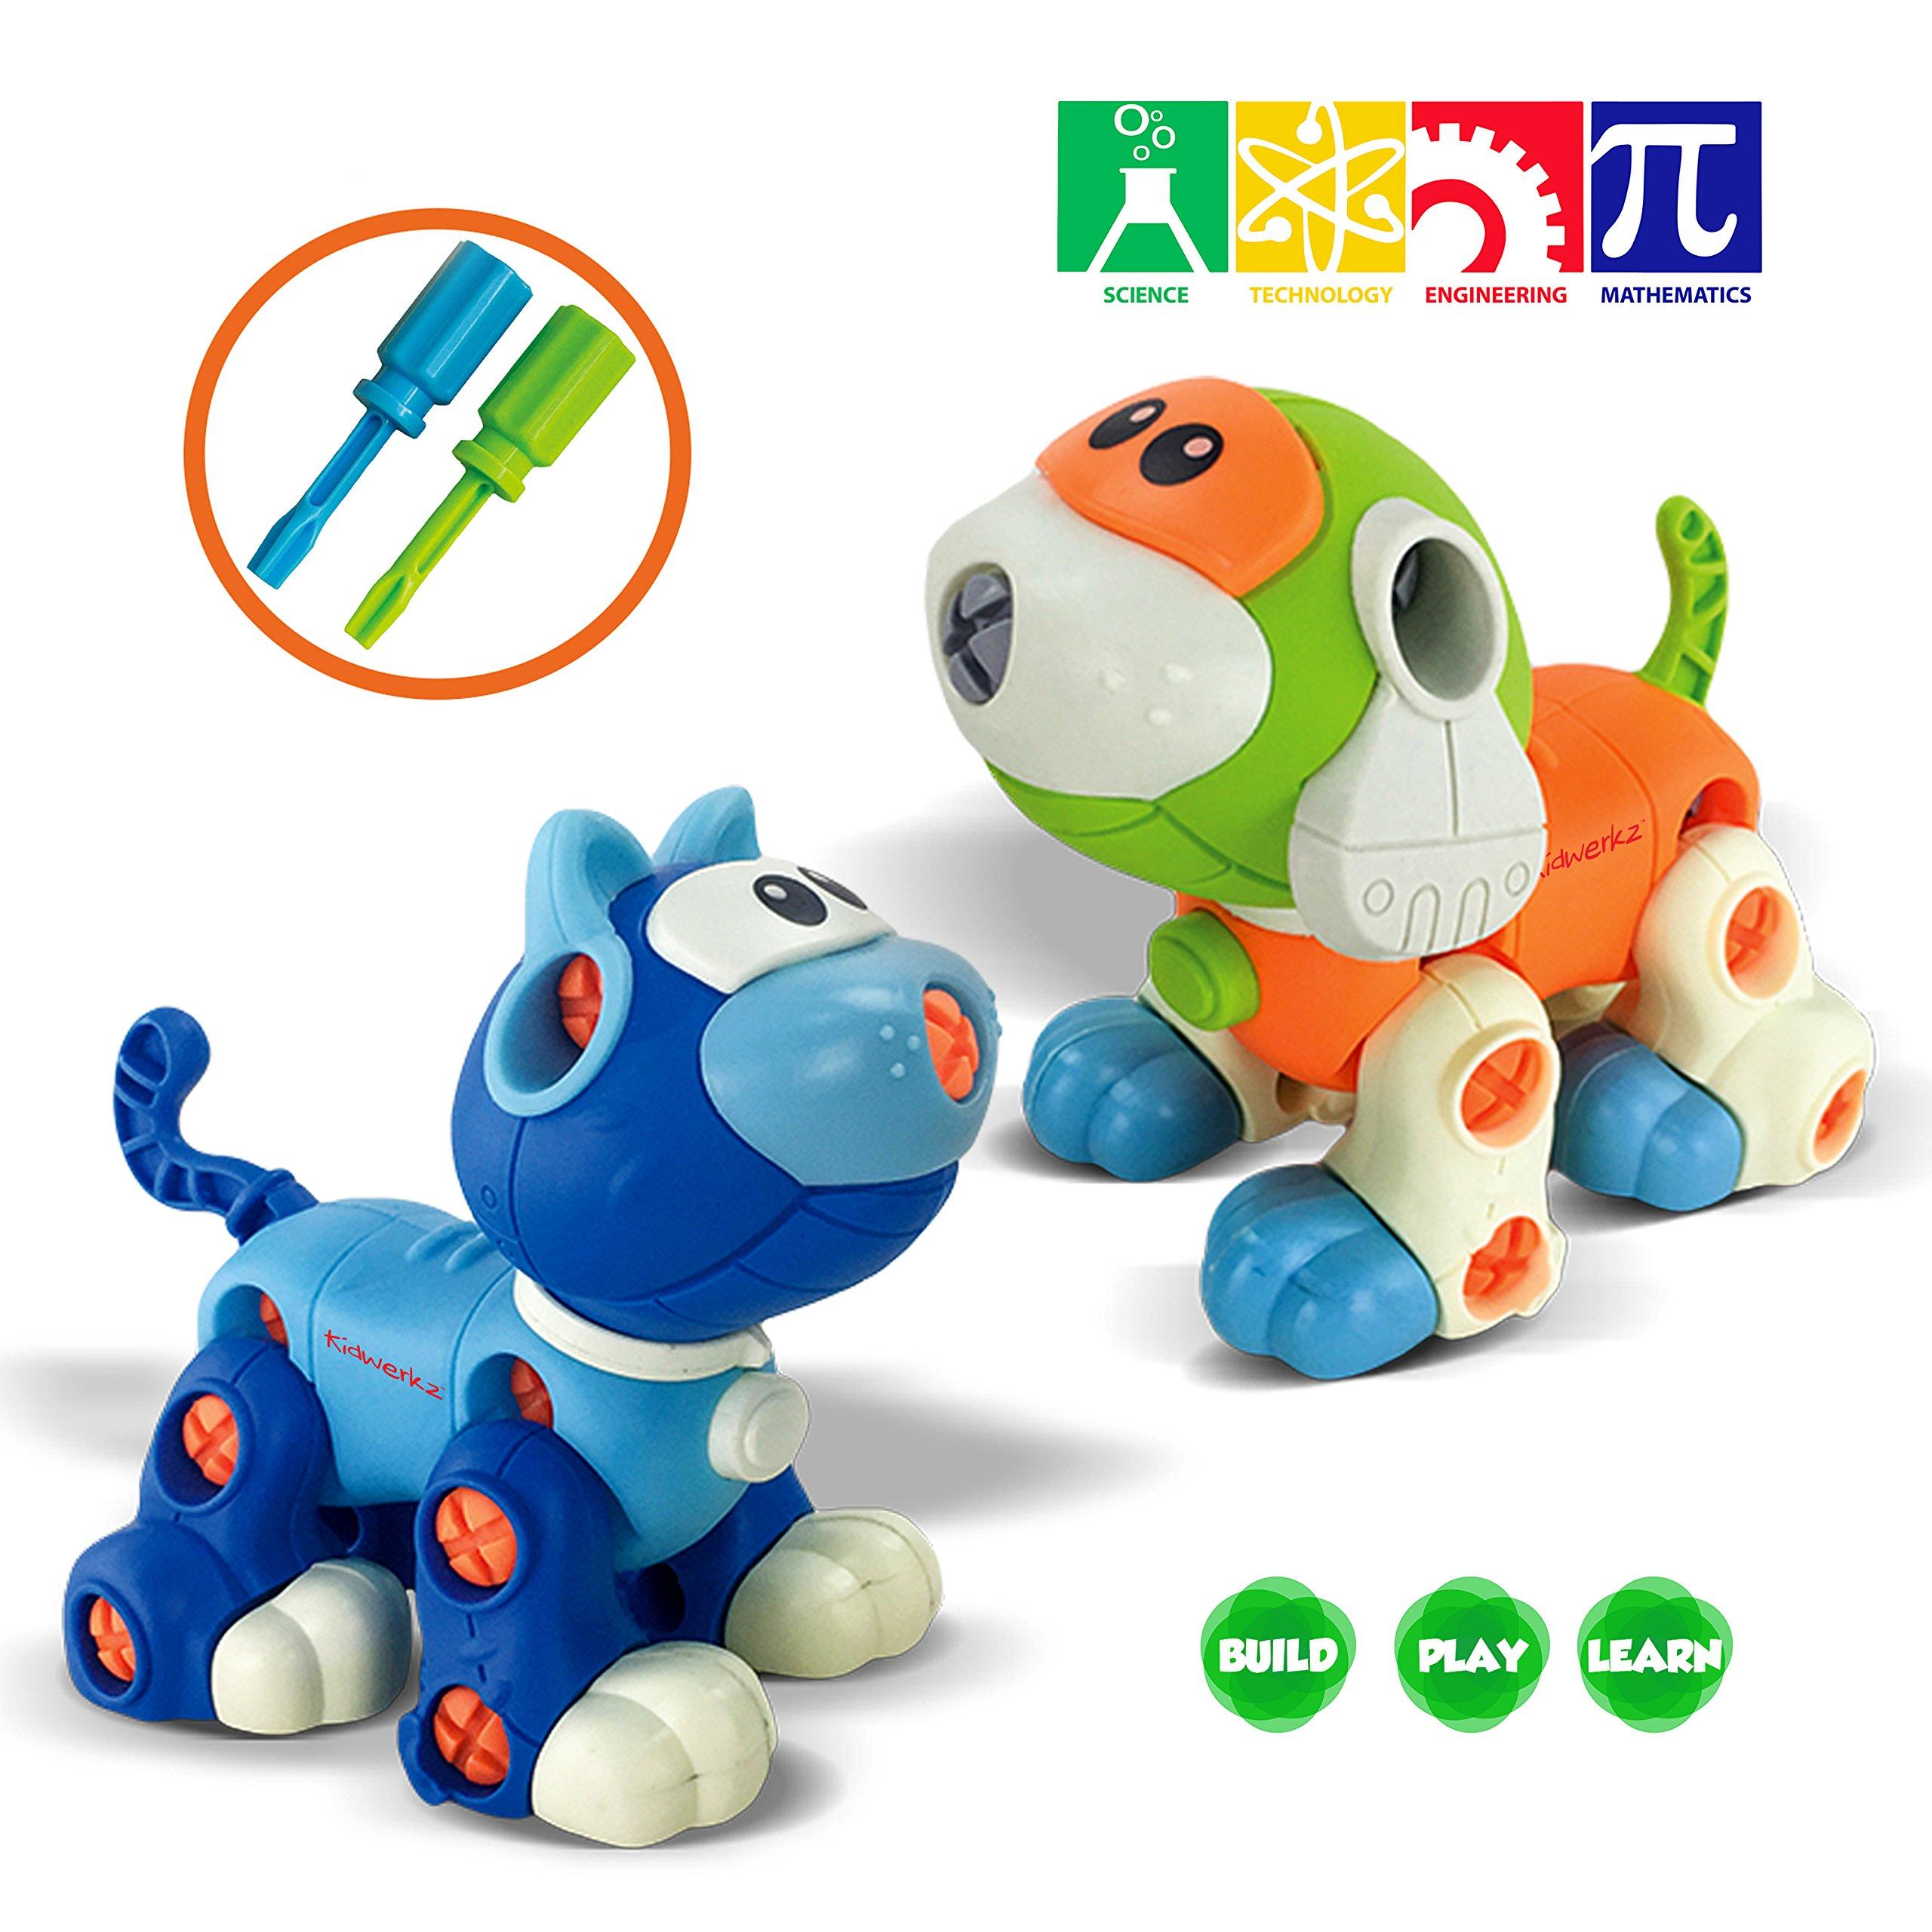 192 pieces Kidtastic Set of 7 Take Apart Toys STEM Building Set